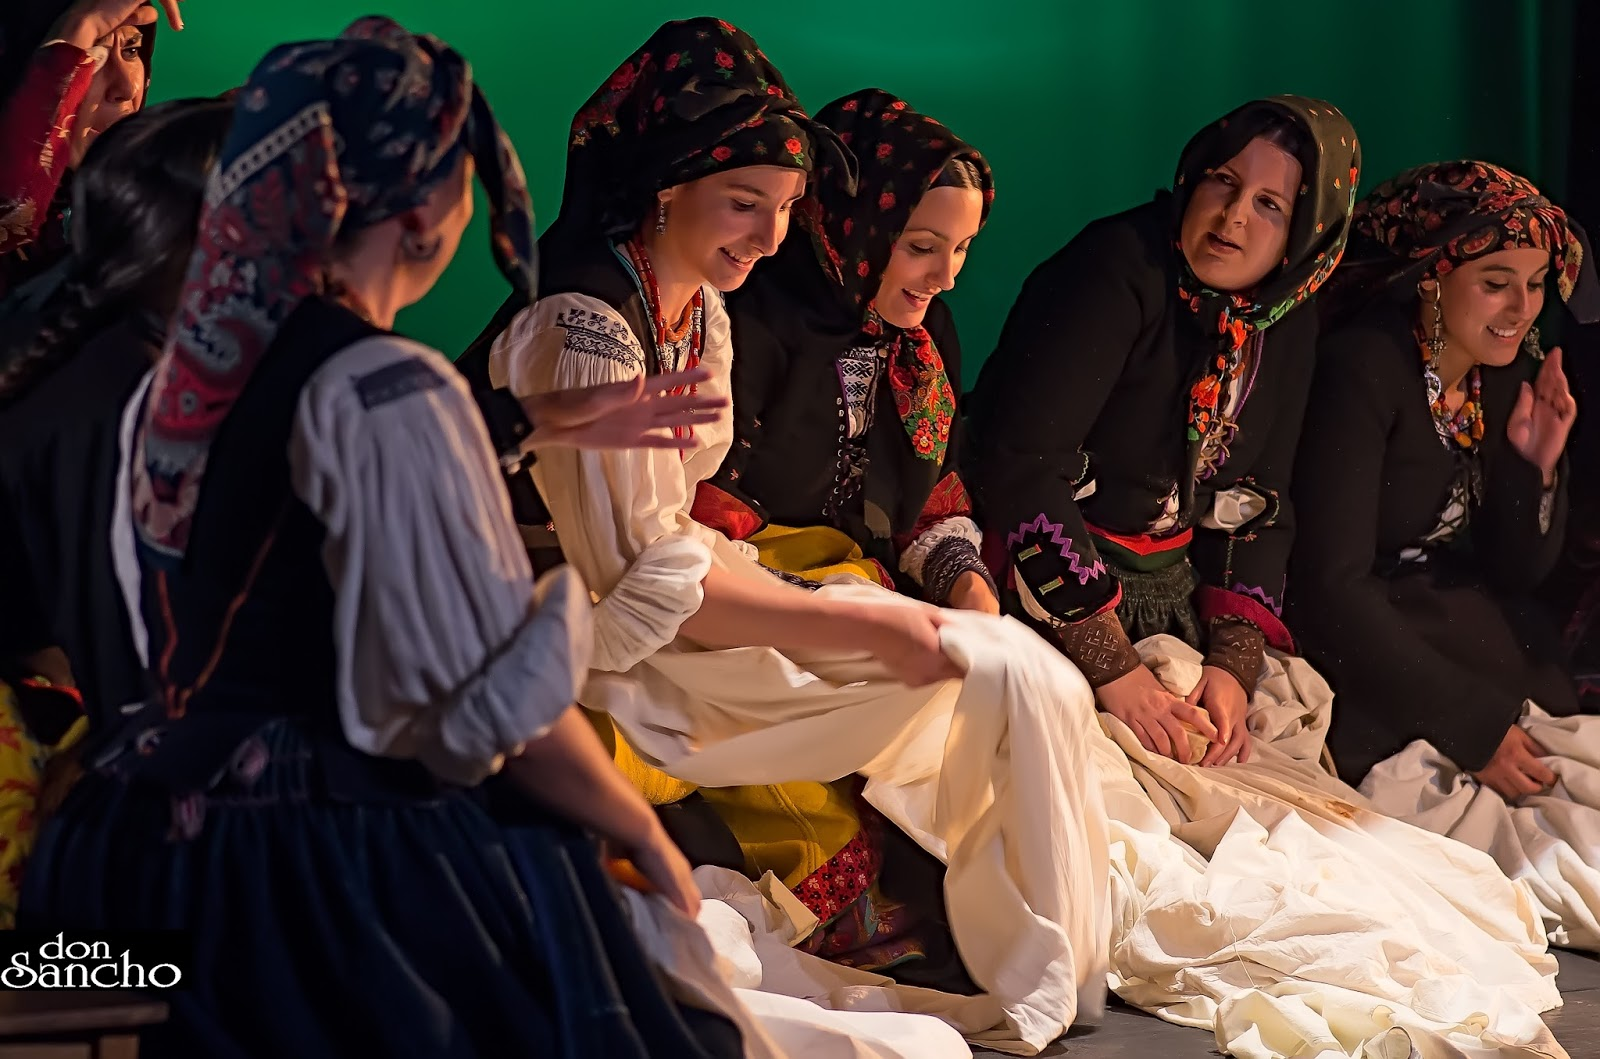 DON SANCHO. Difusión de la Cultura Tradicional de Zamora ... - photo#39